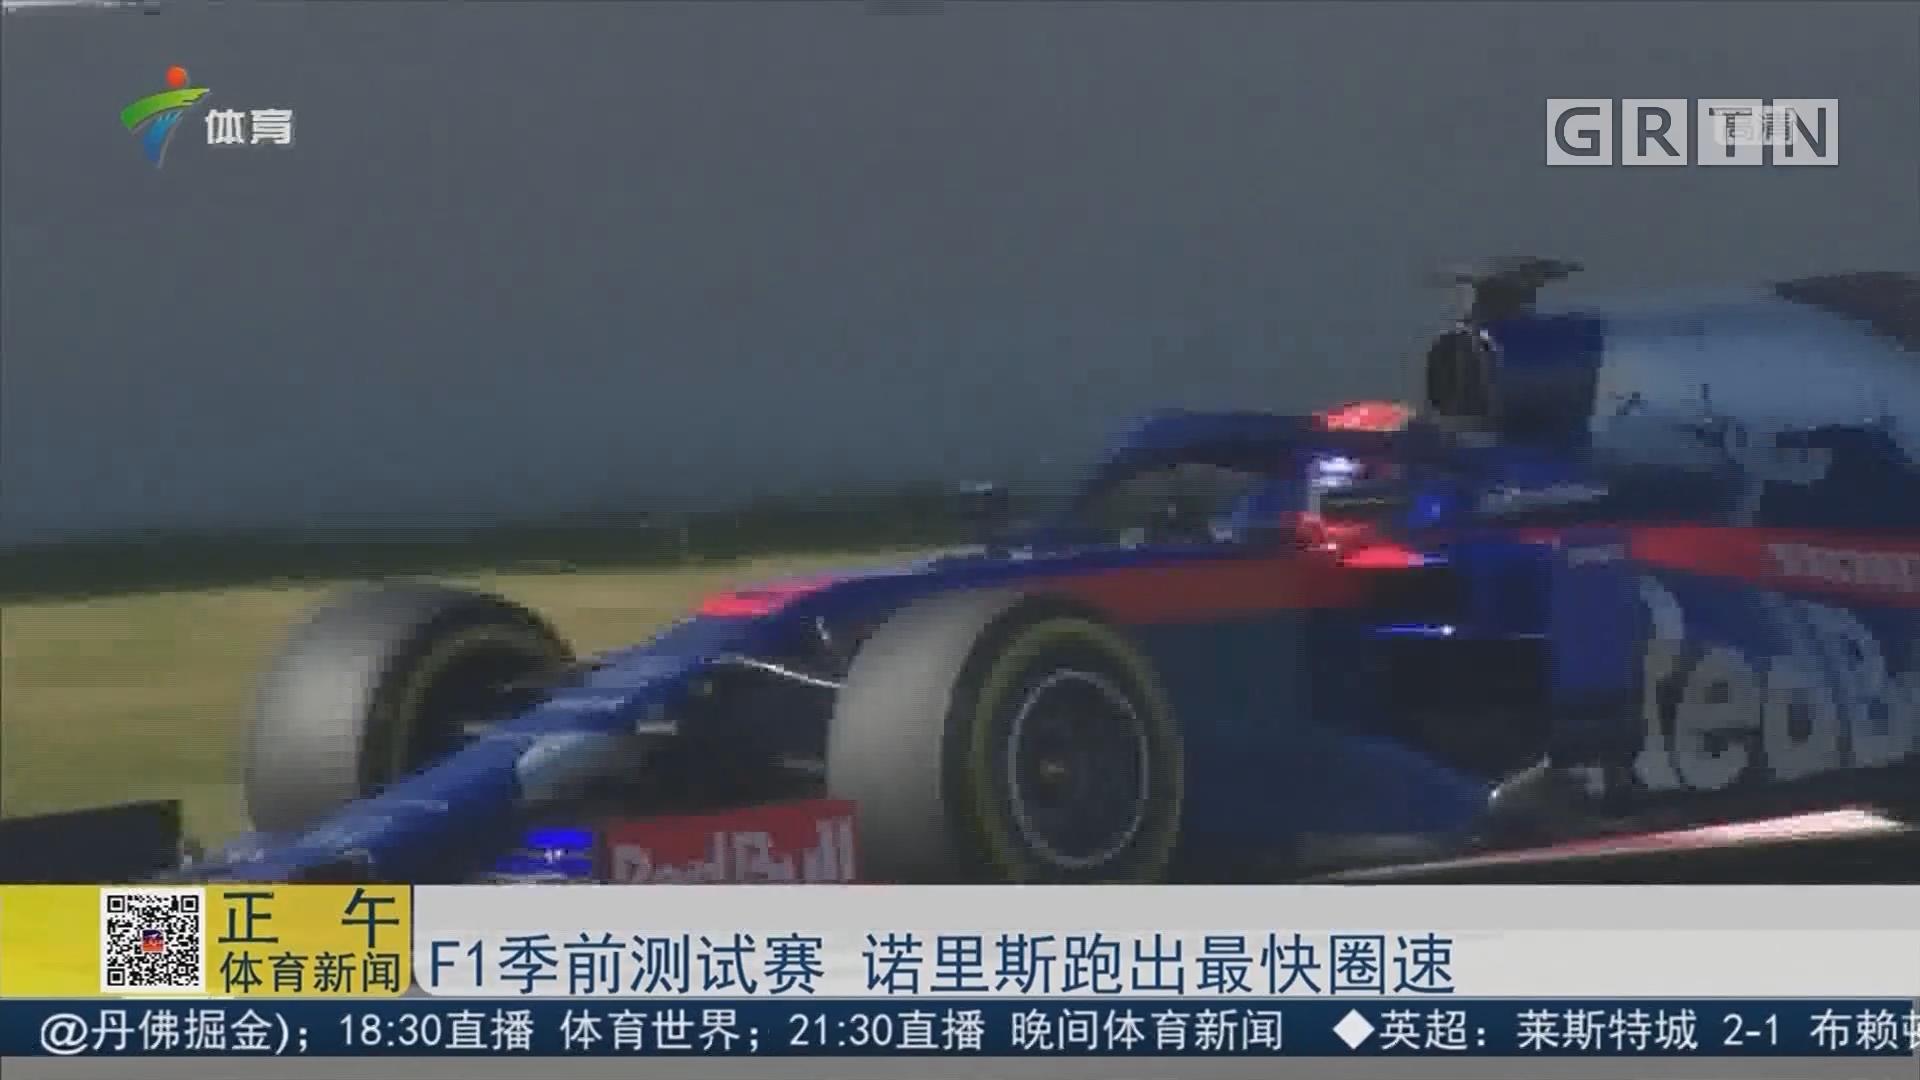 F1季前测试赛 诺里斯跑出最快圈速